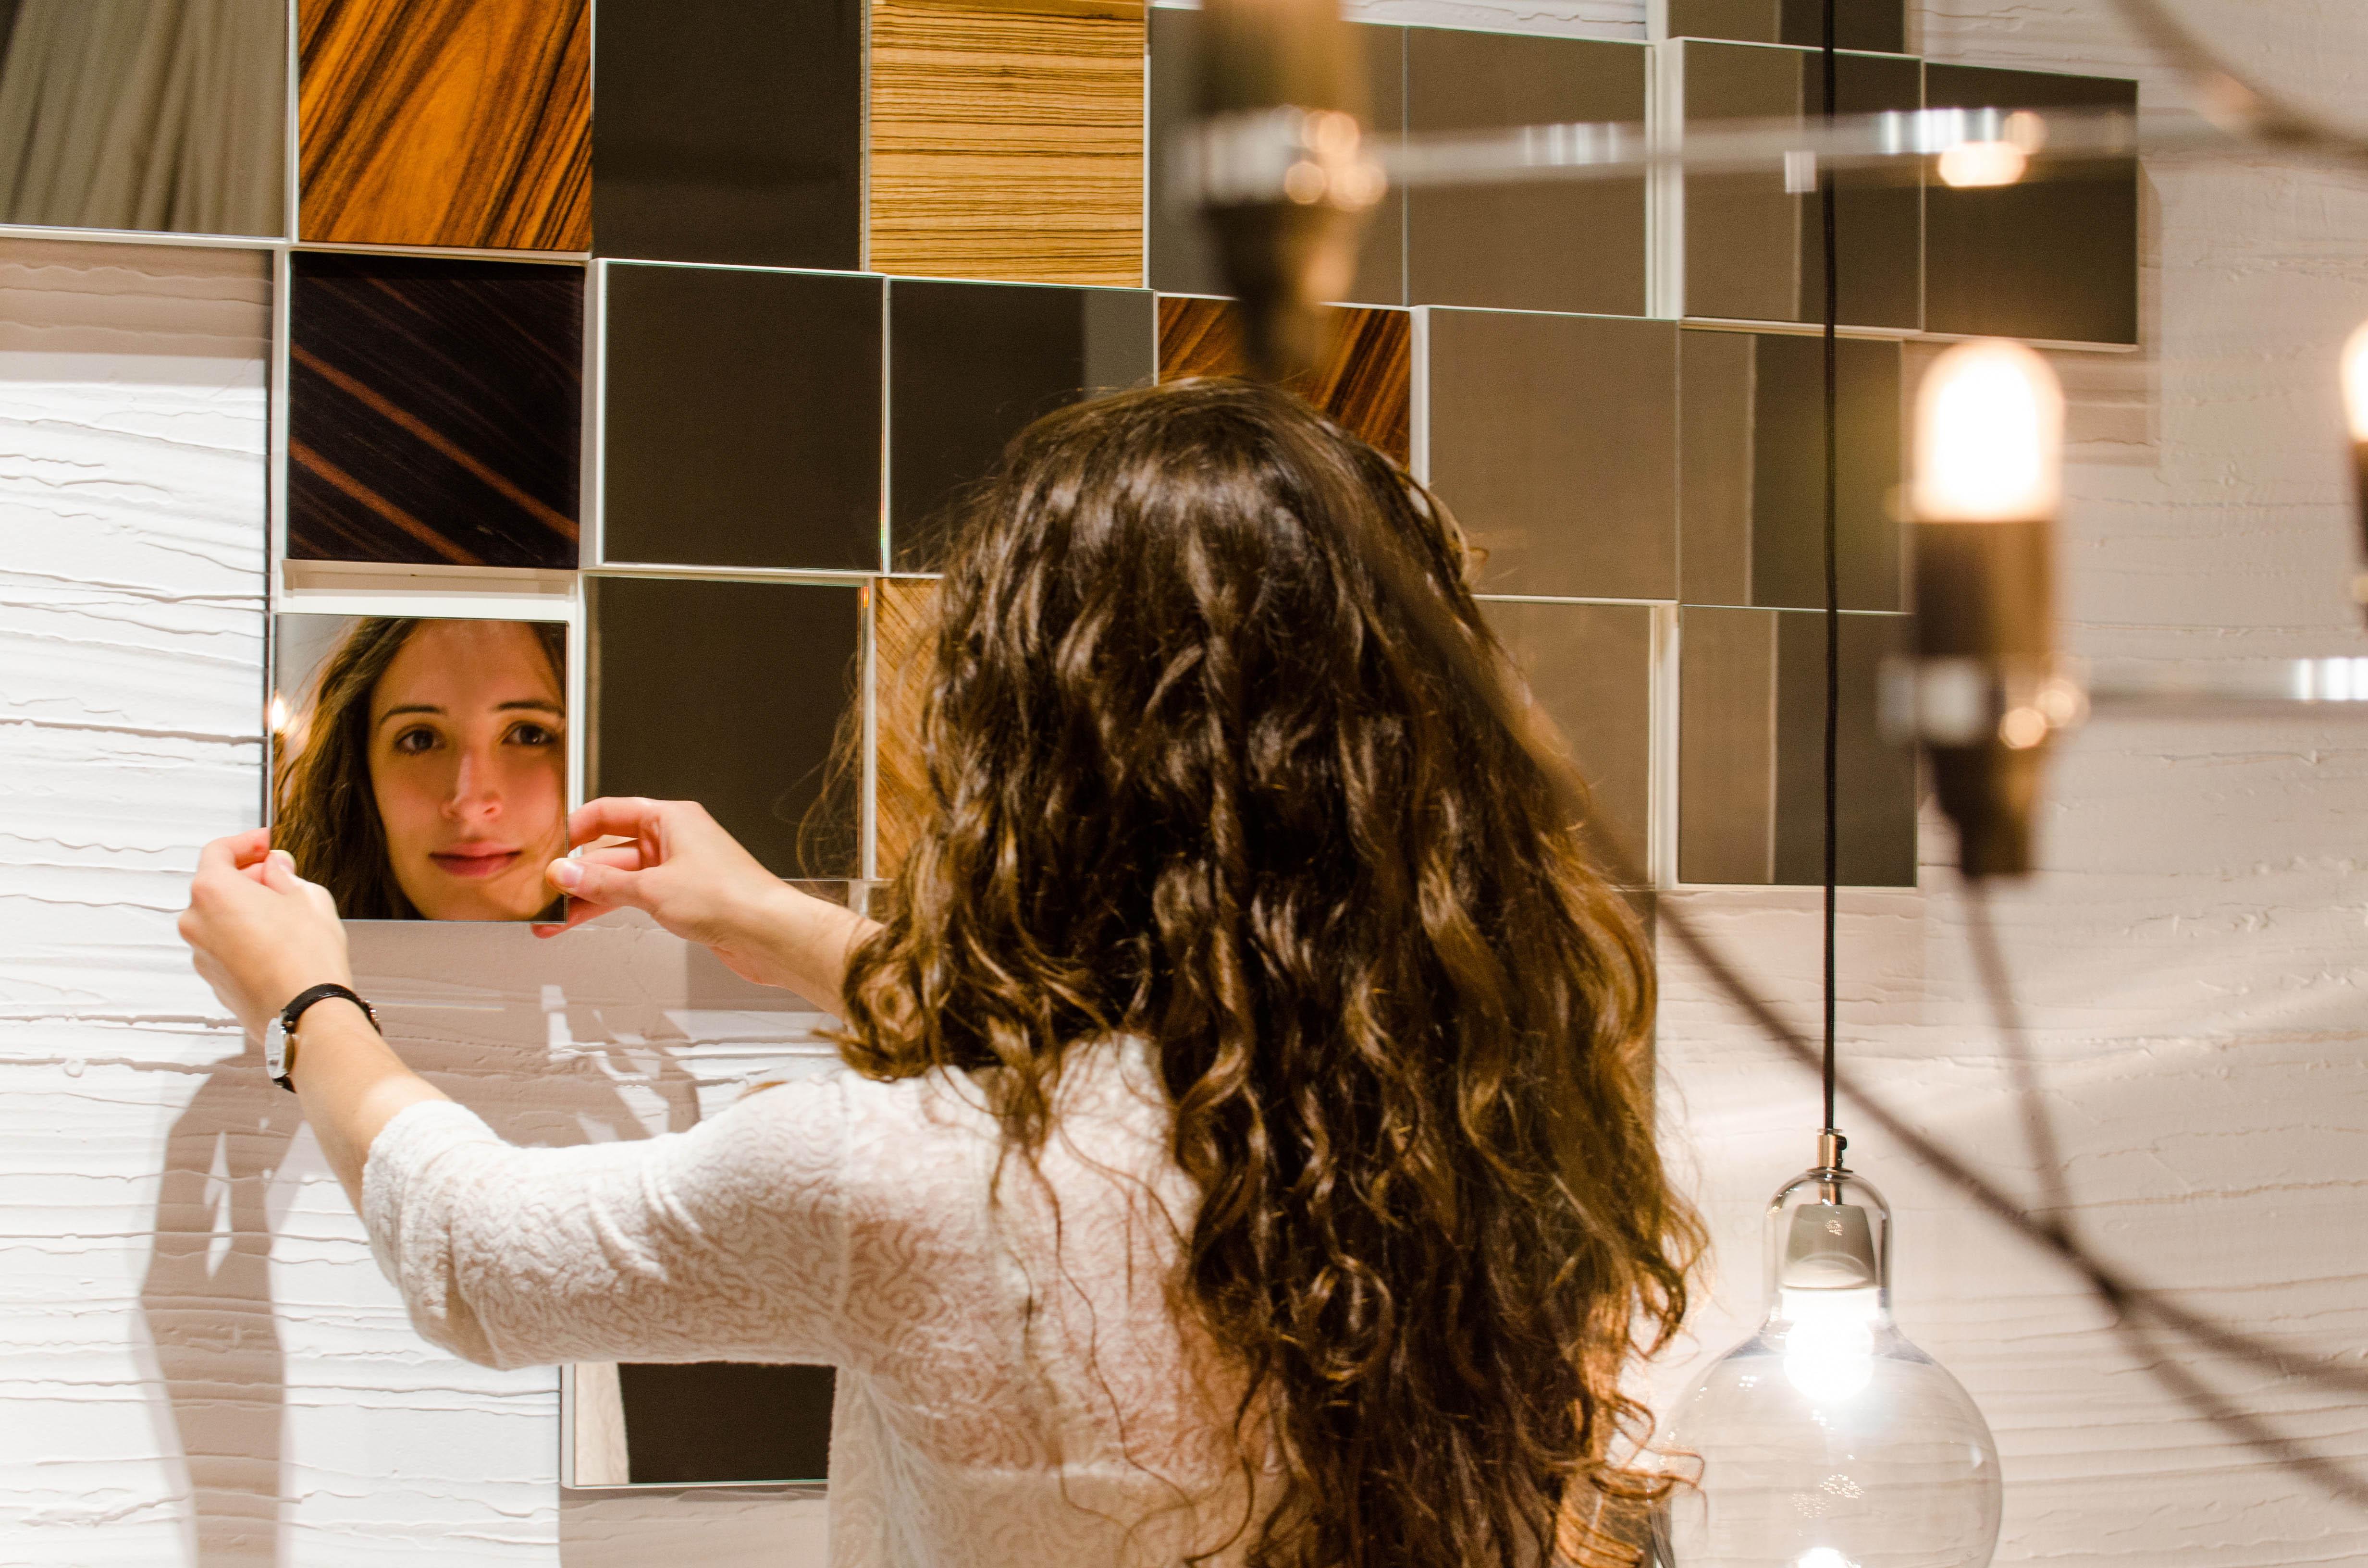 Collage-Mirror-just3ds.com-6